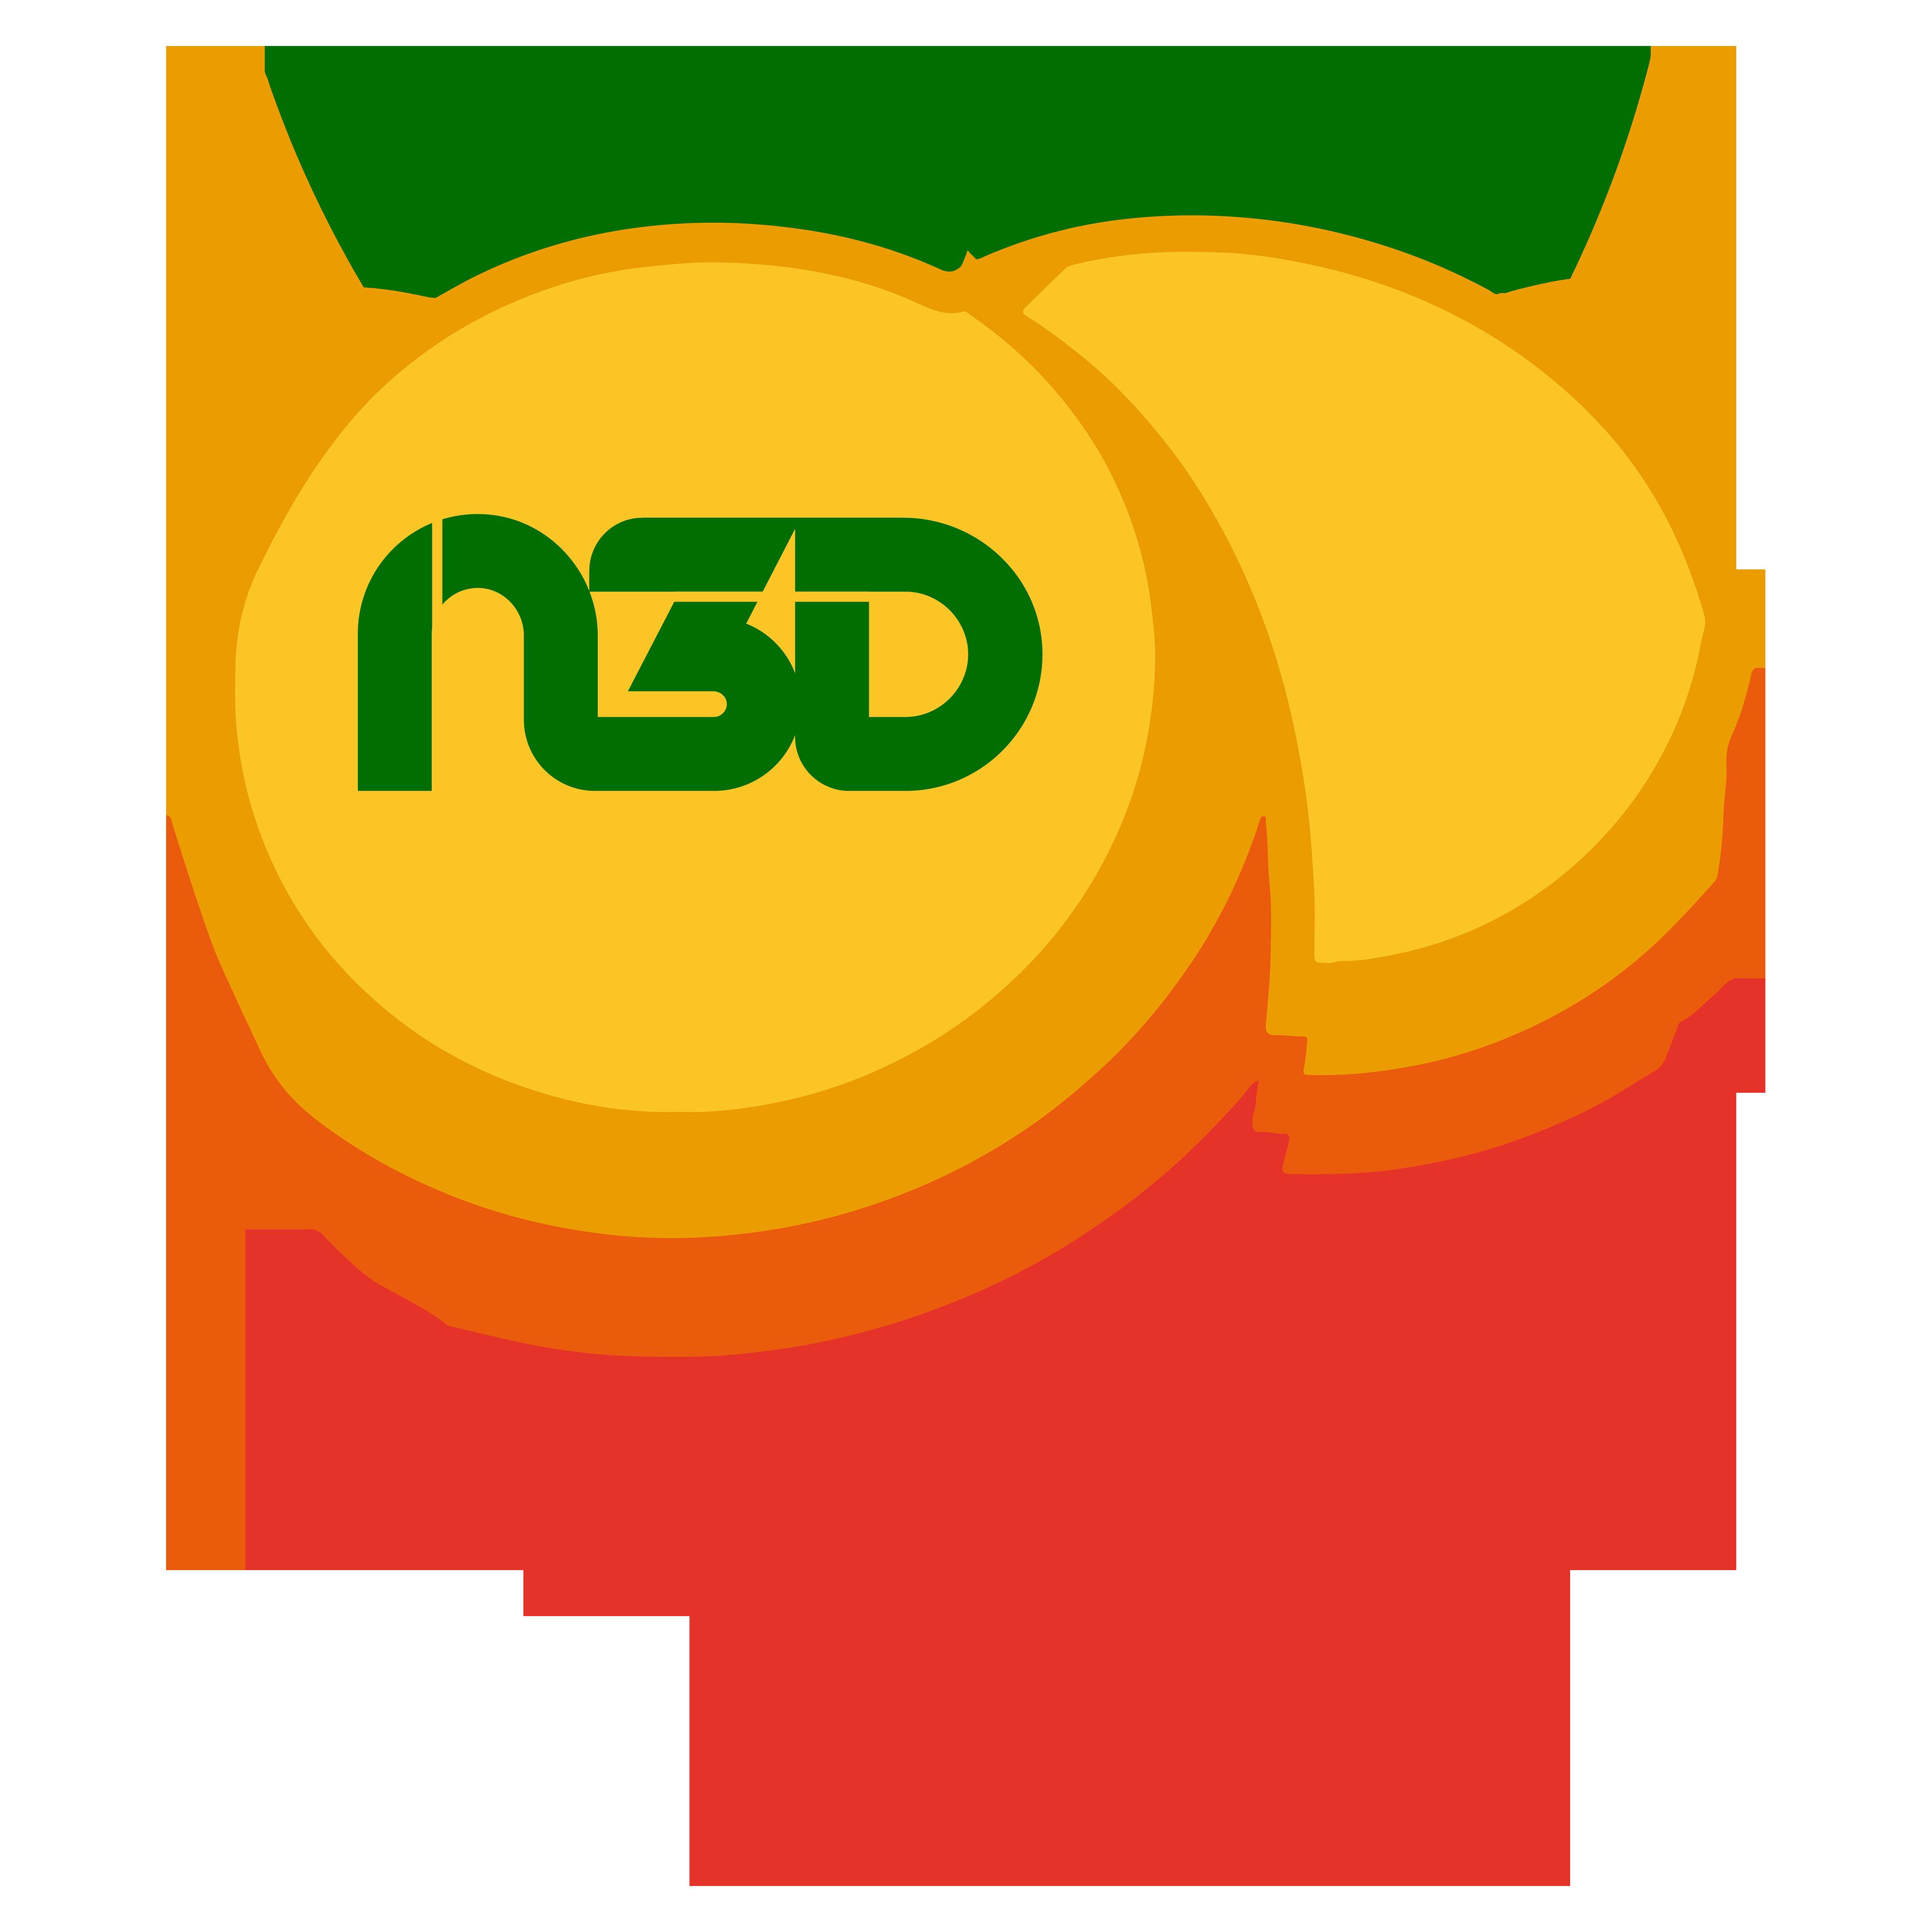 narvalo 3d logo